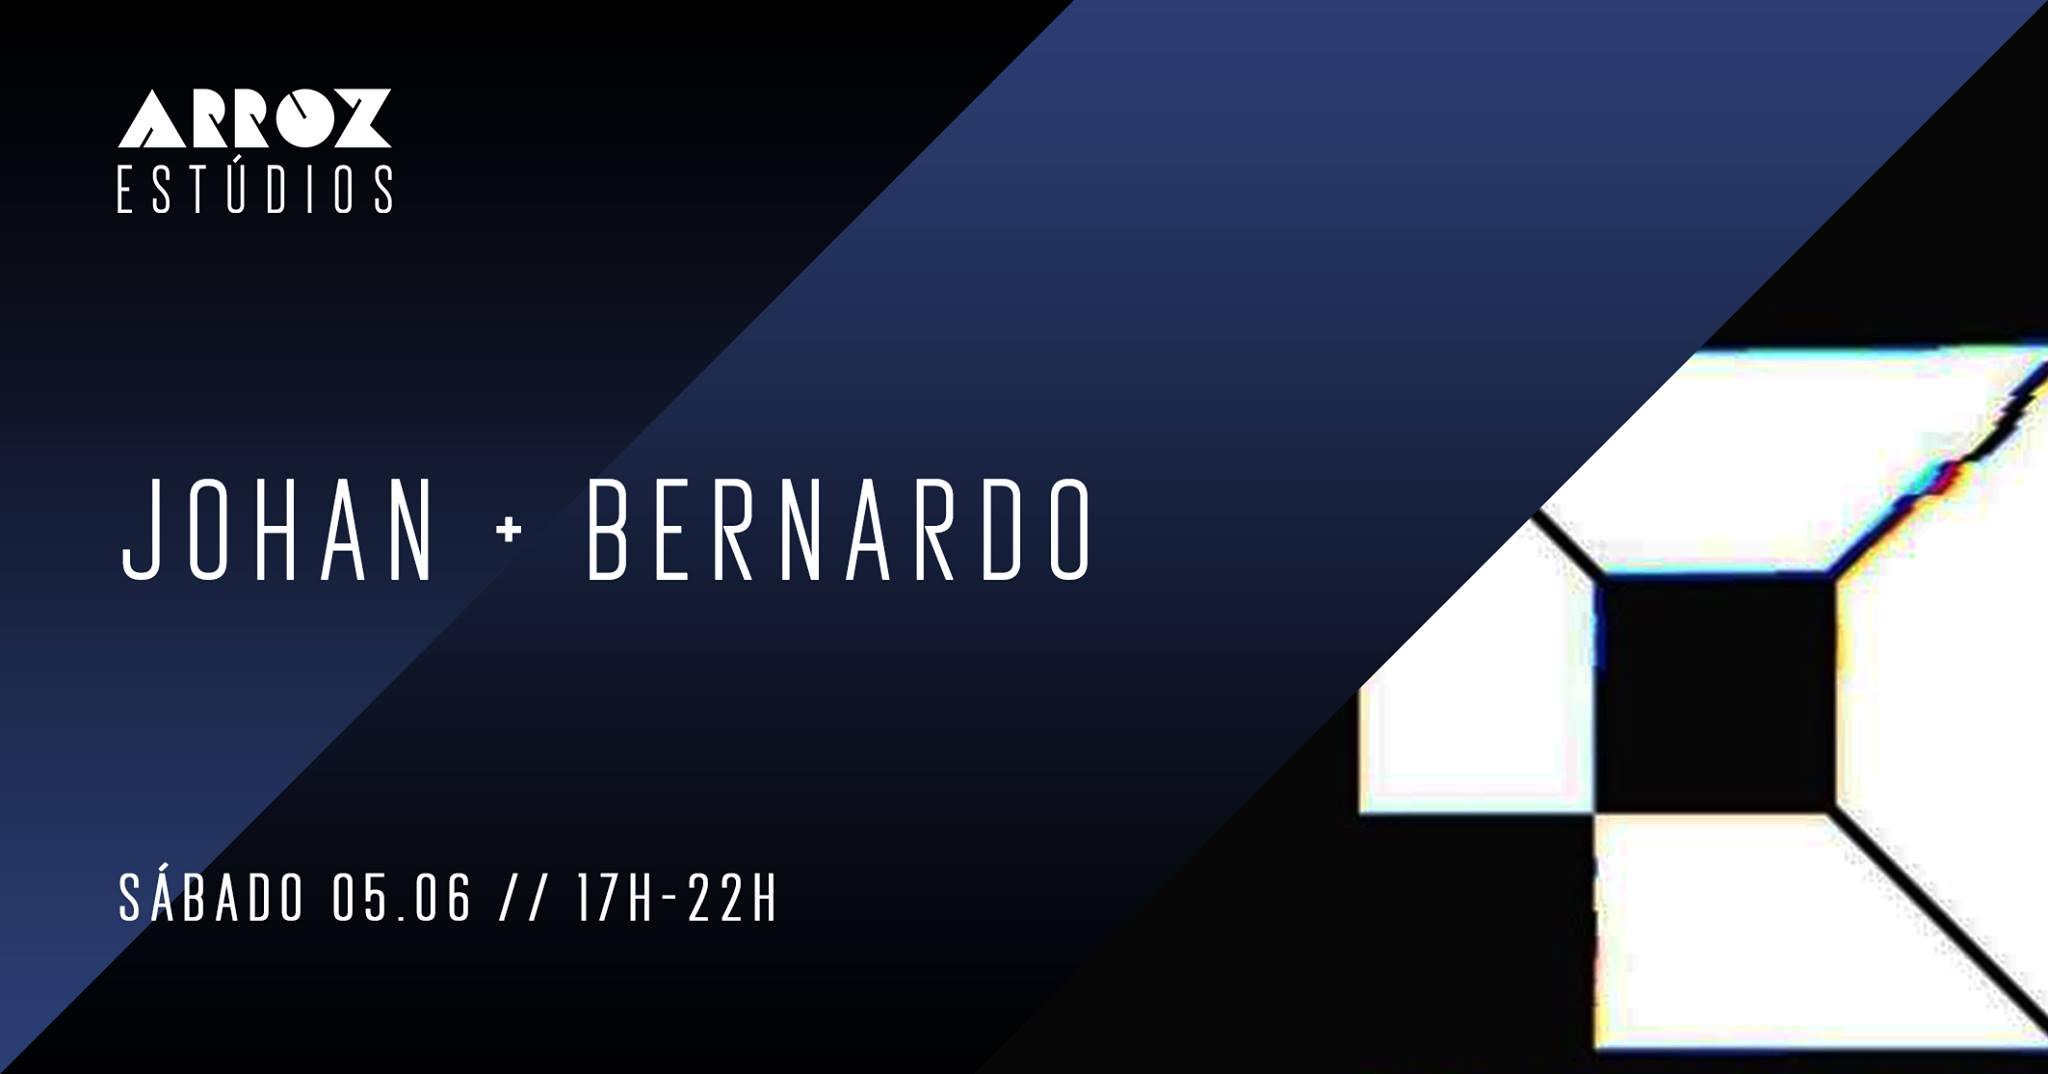 Arroz Esplanadas: Johan + Bernardo